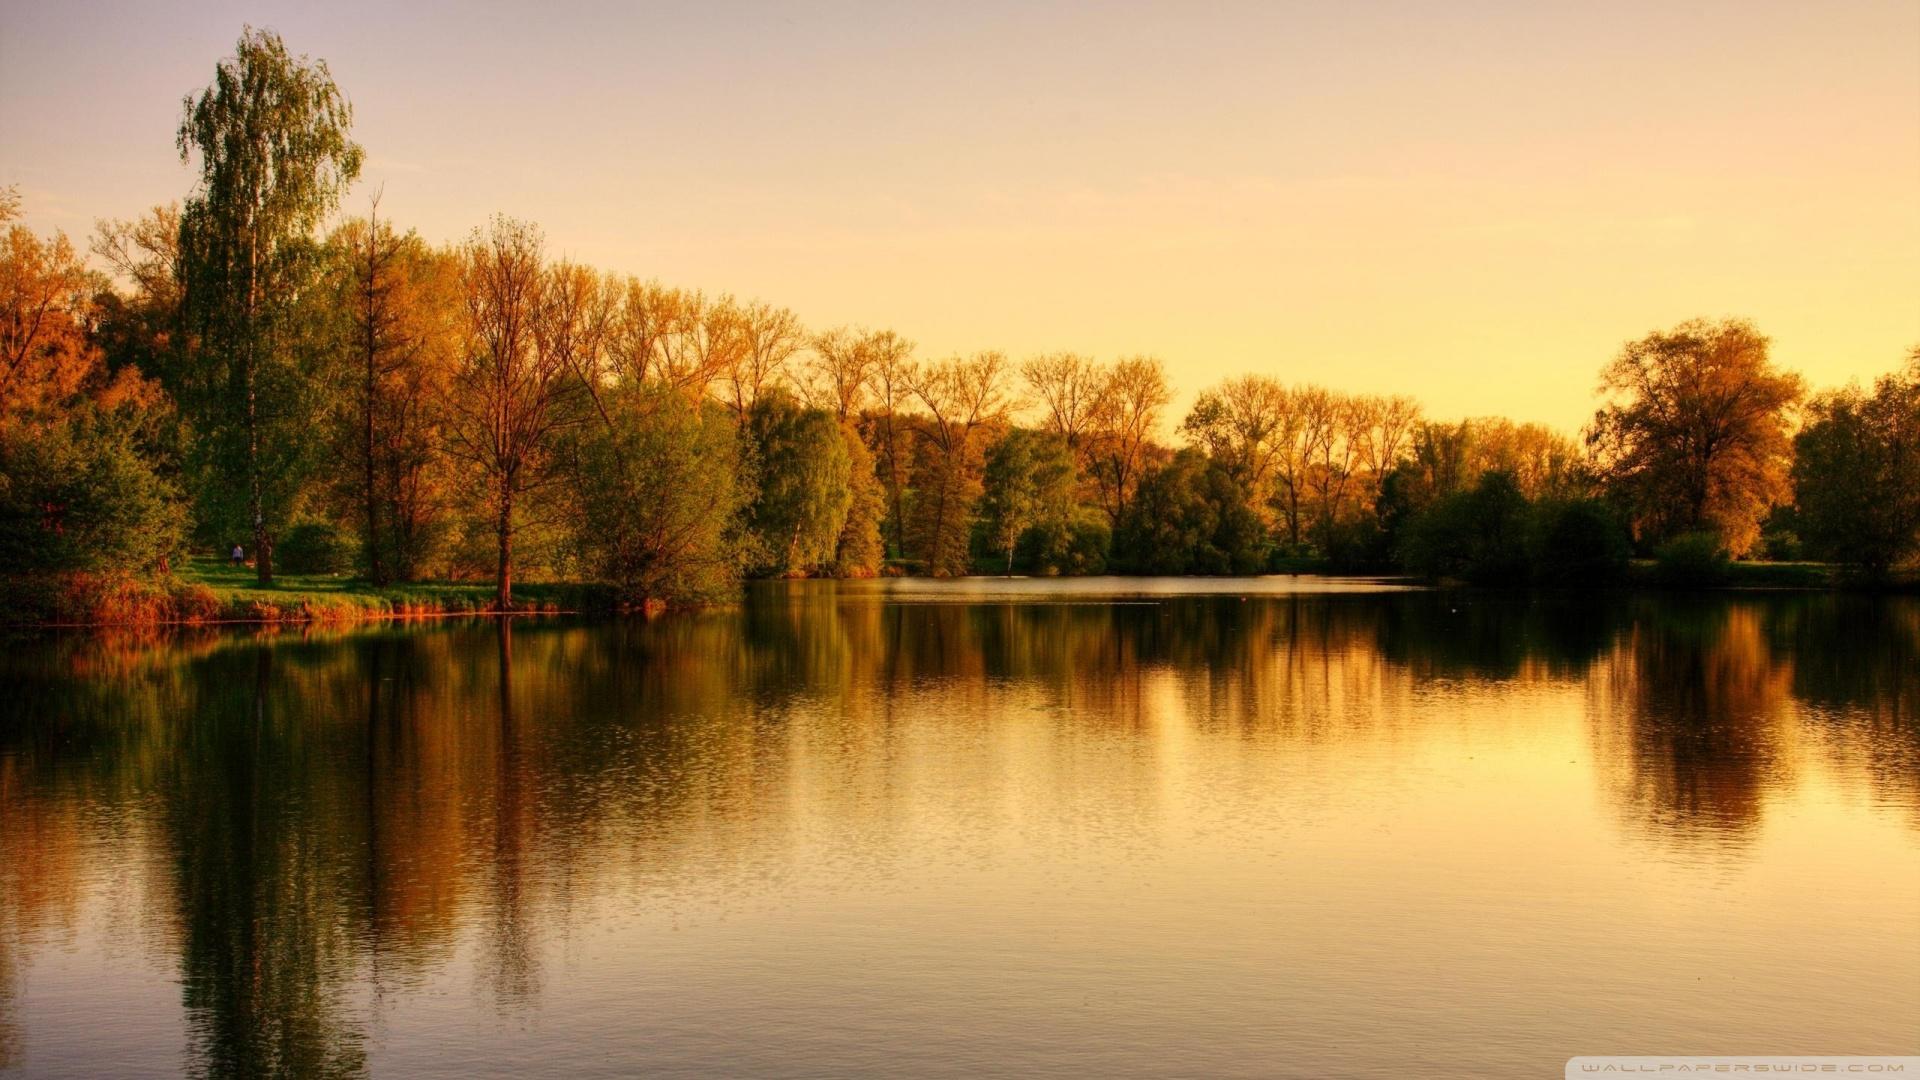 http://s5.picofile.com/file/8157366434/sunset_over_the_lake_wallpaper_1920x1080.jpg